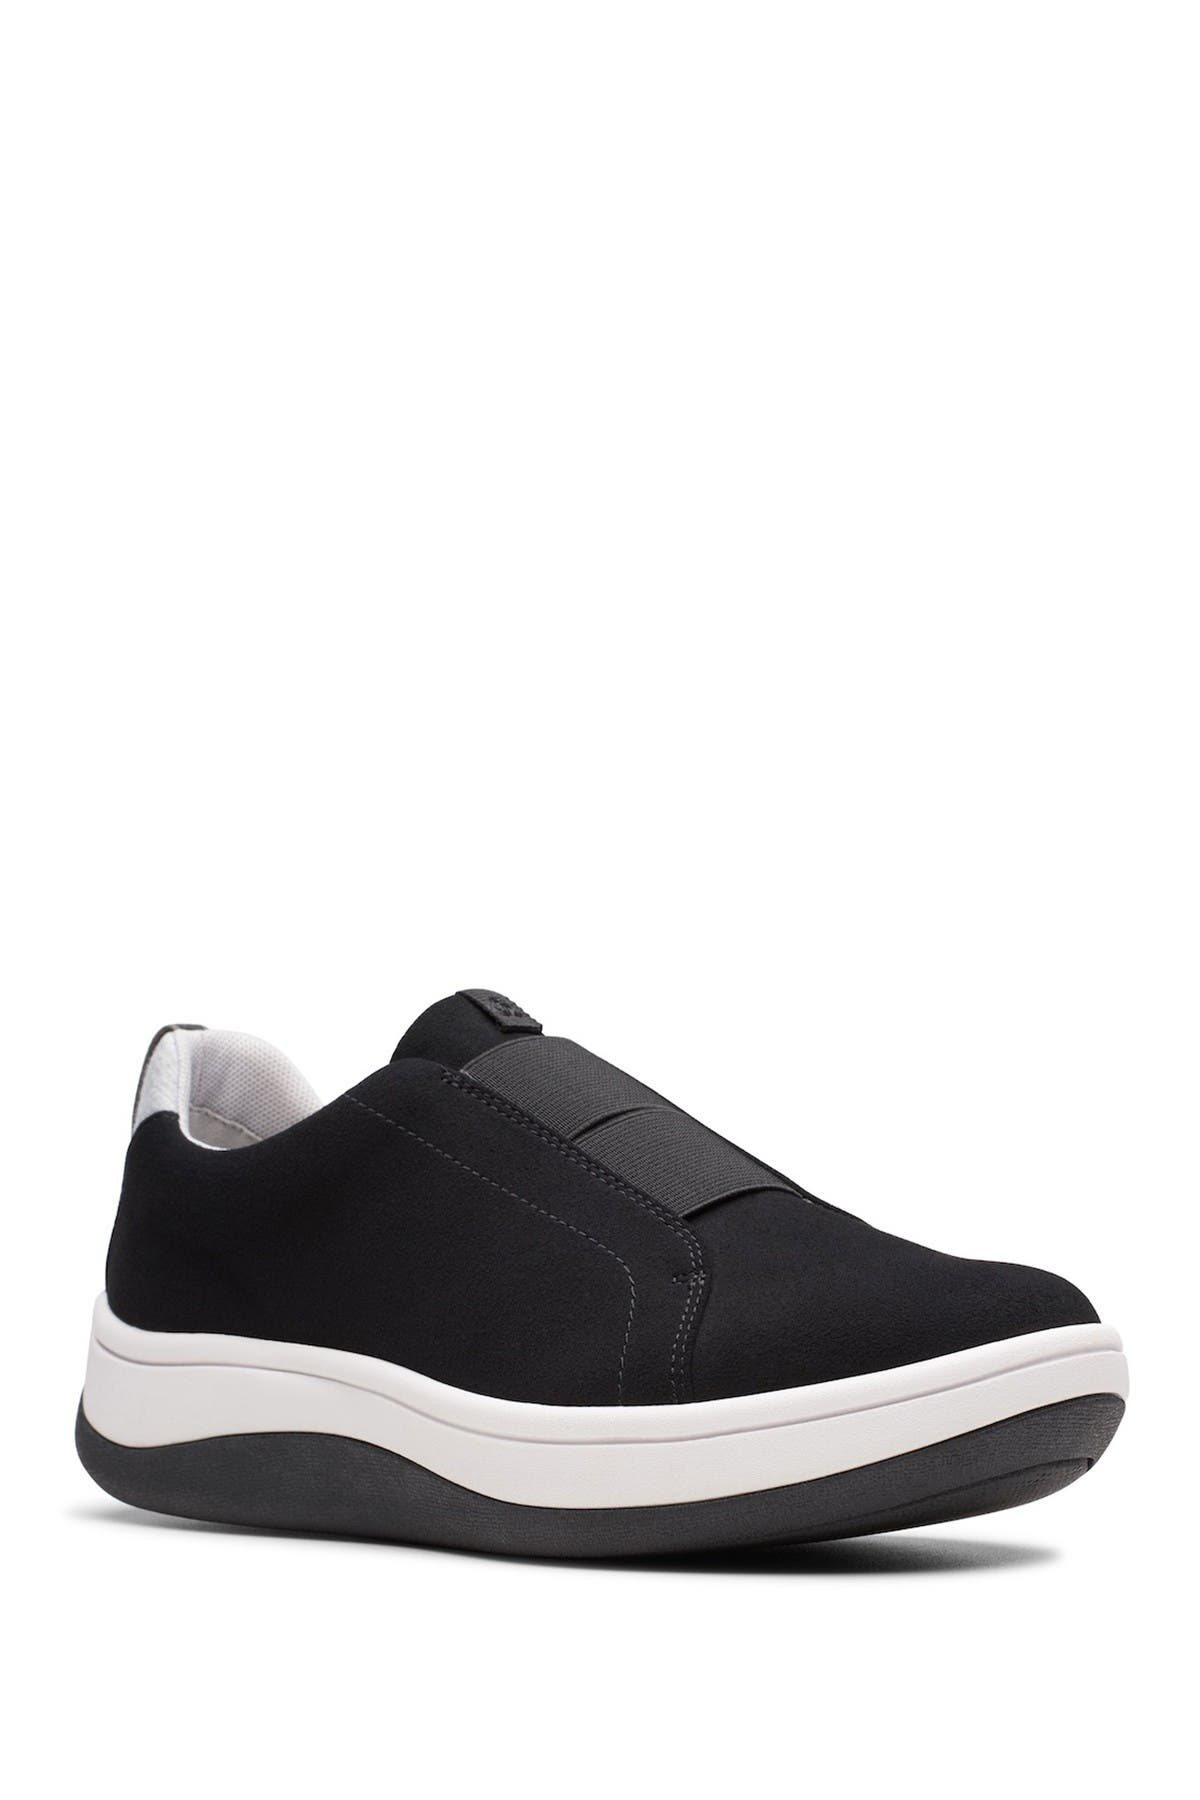 Image of Clarks Arla Sage Sneaker